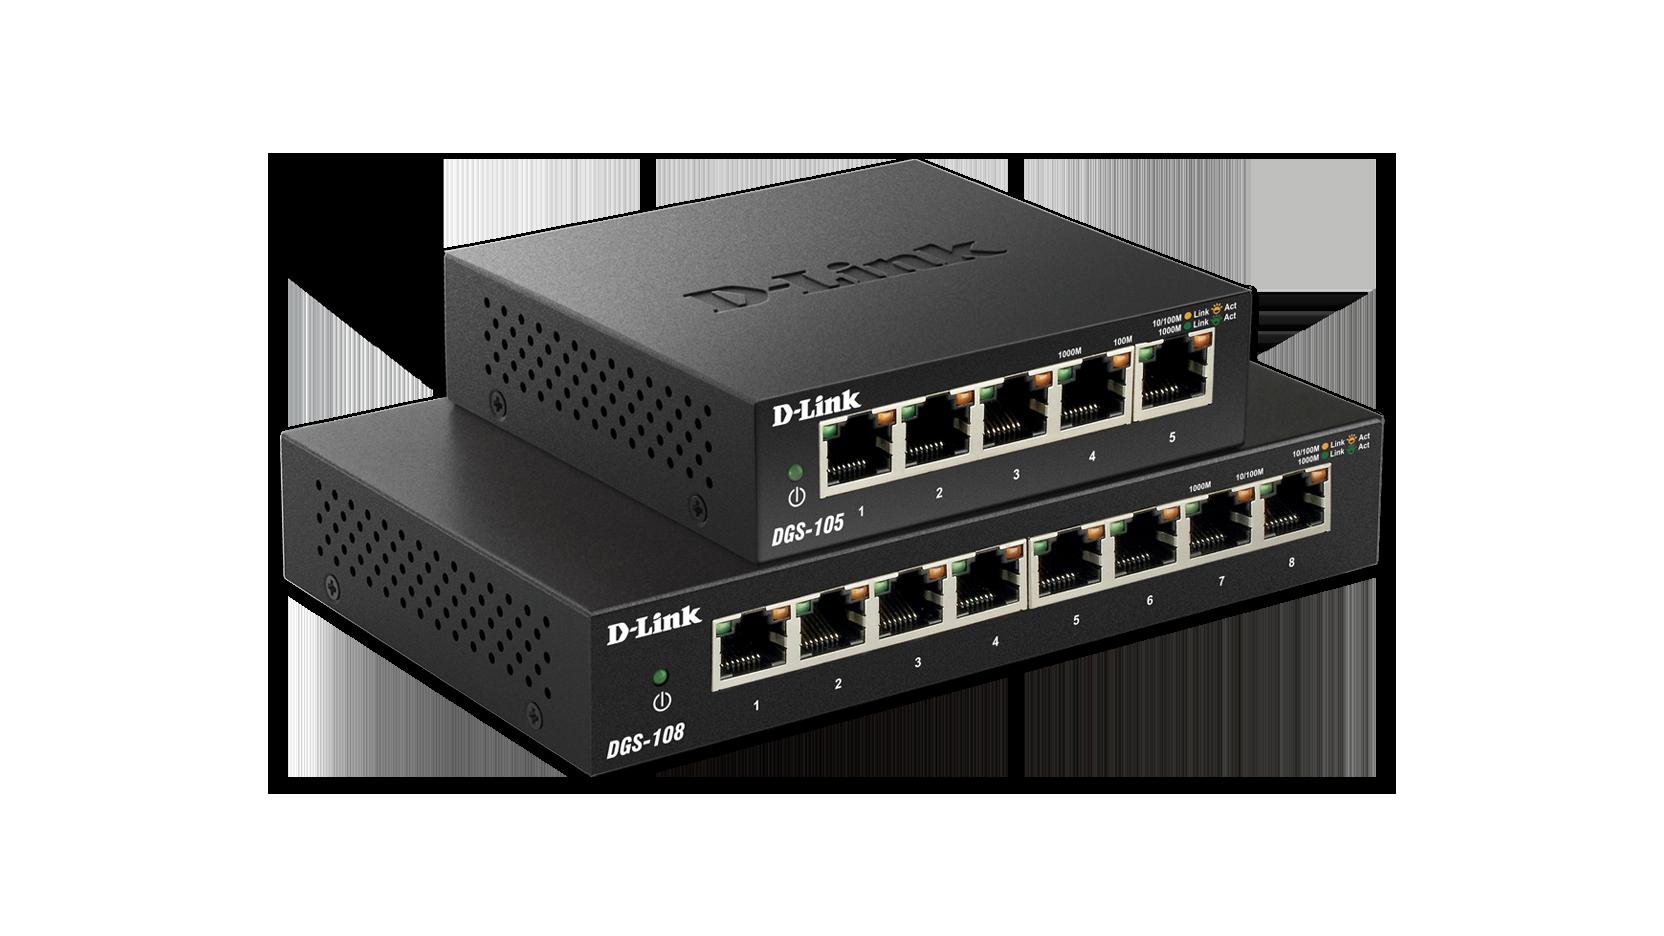 5 Port Gigabit Ethernet Unmanaged Metal Desktop Switch Dgs 105 D Ether Crossover Cable Diagram Further Also Cat Link